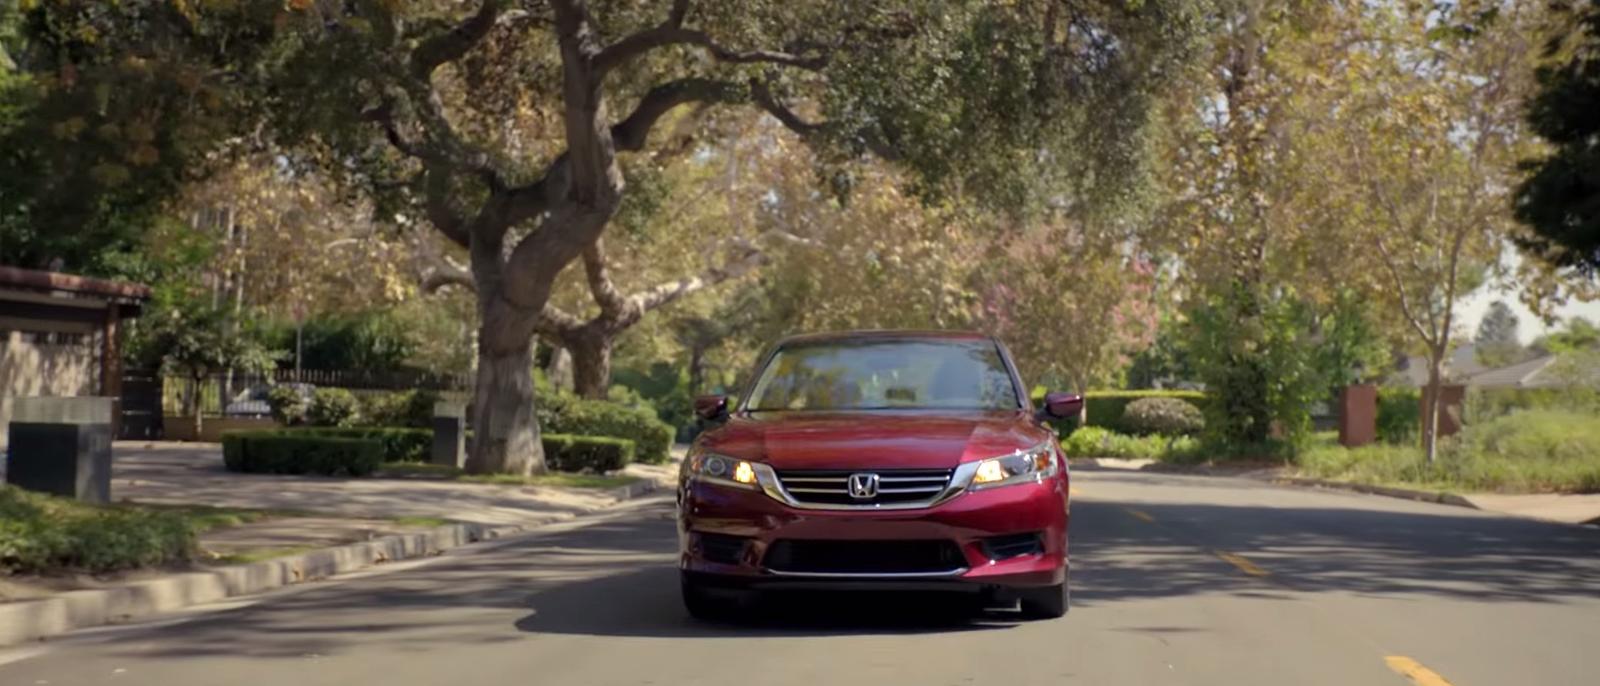 2015 Honda Accord Front Exterior